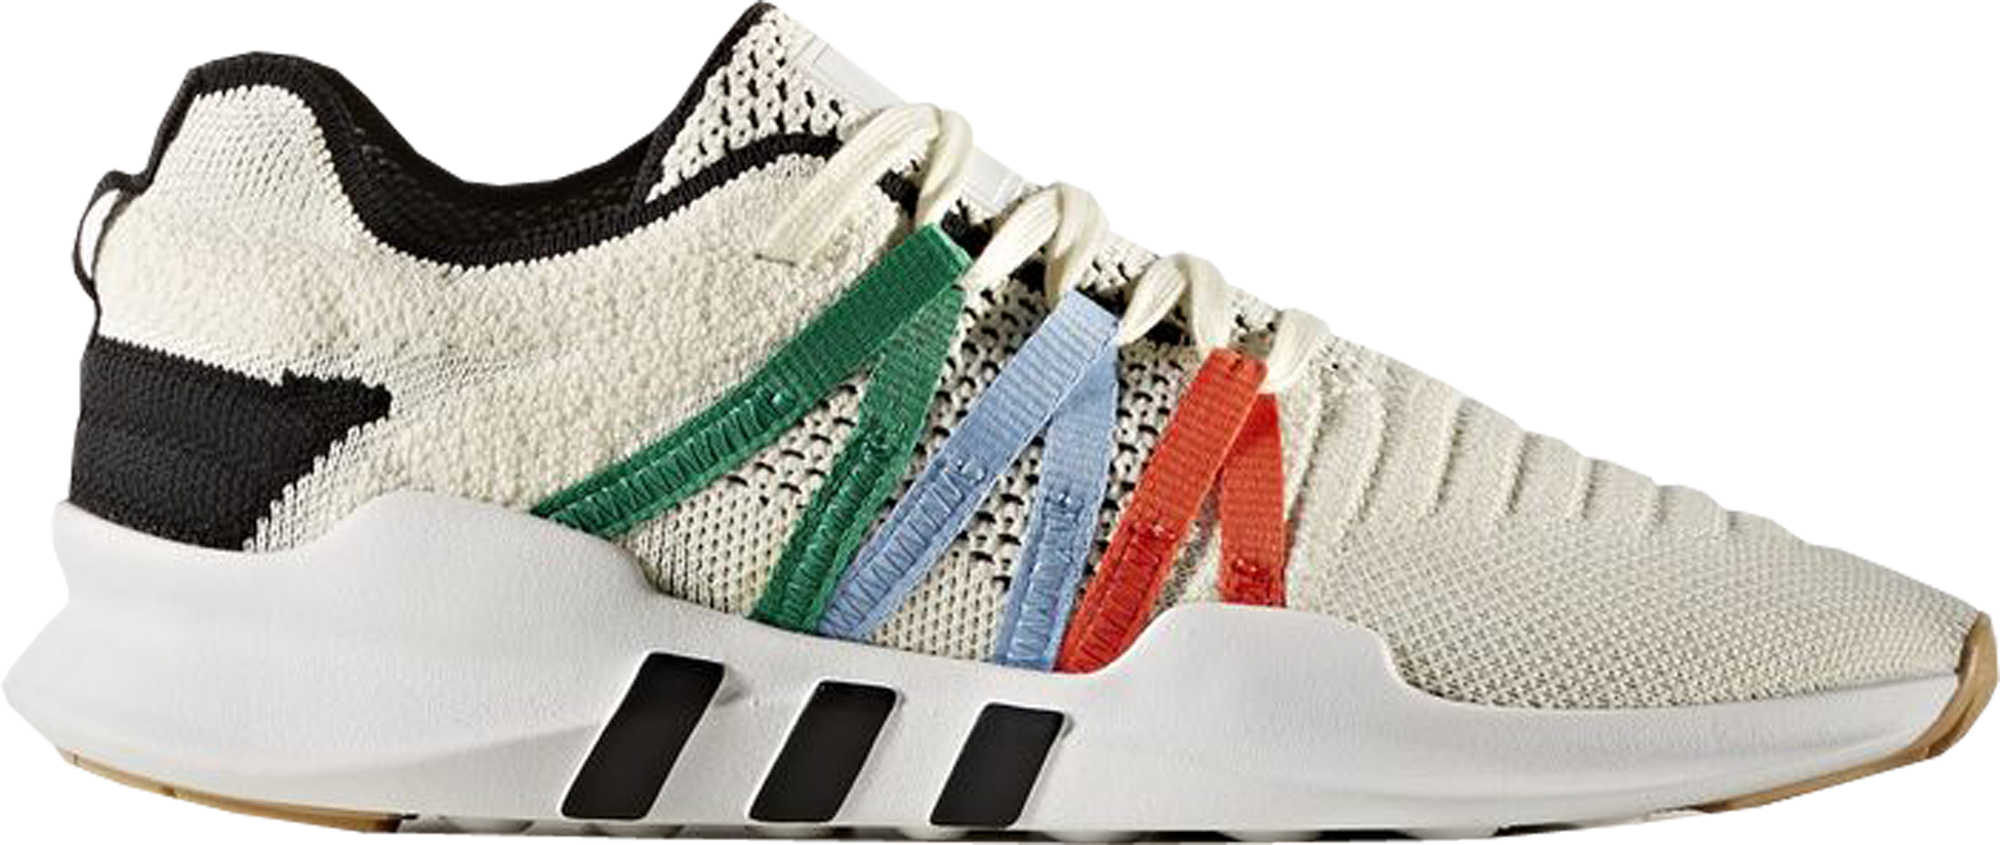 ... sale adidas eqt racing adv cream white w 909b8 226ee a06109c0f40c